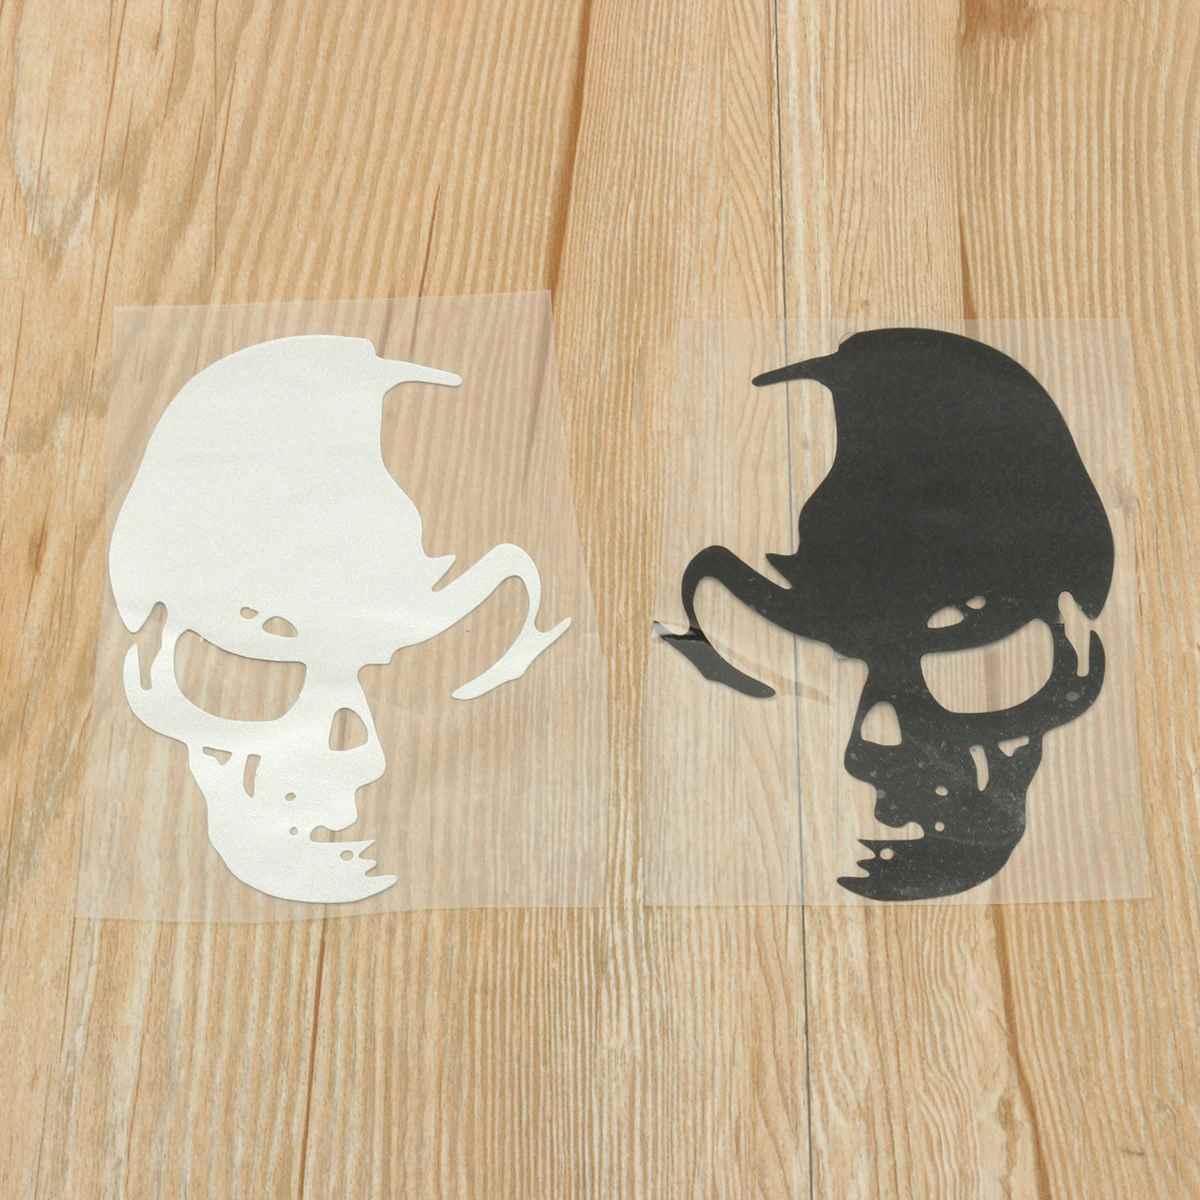 Fashion Skull Car Decal Stickers Auto Emblem Bandage Decoration Window Sticker Black White